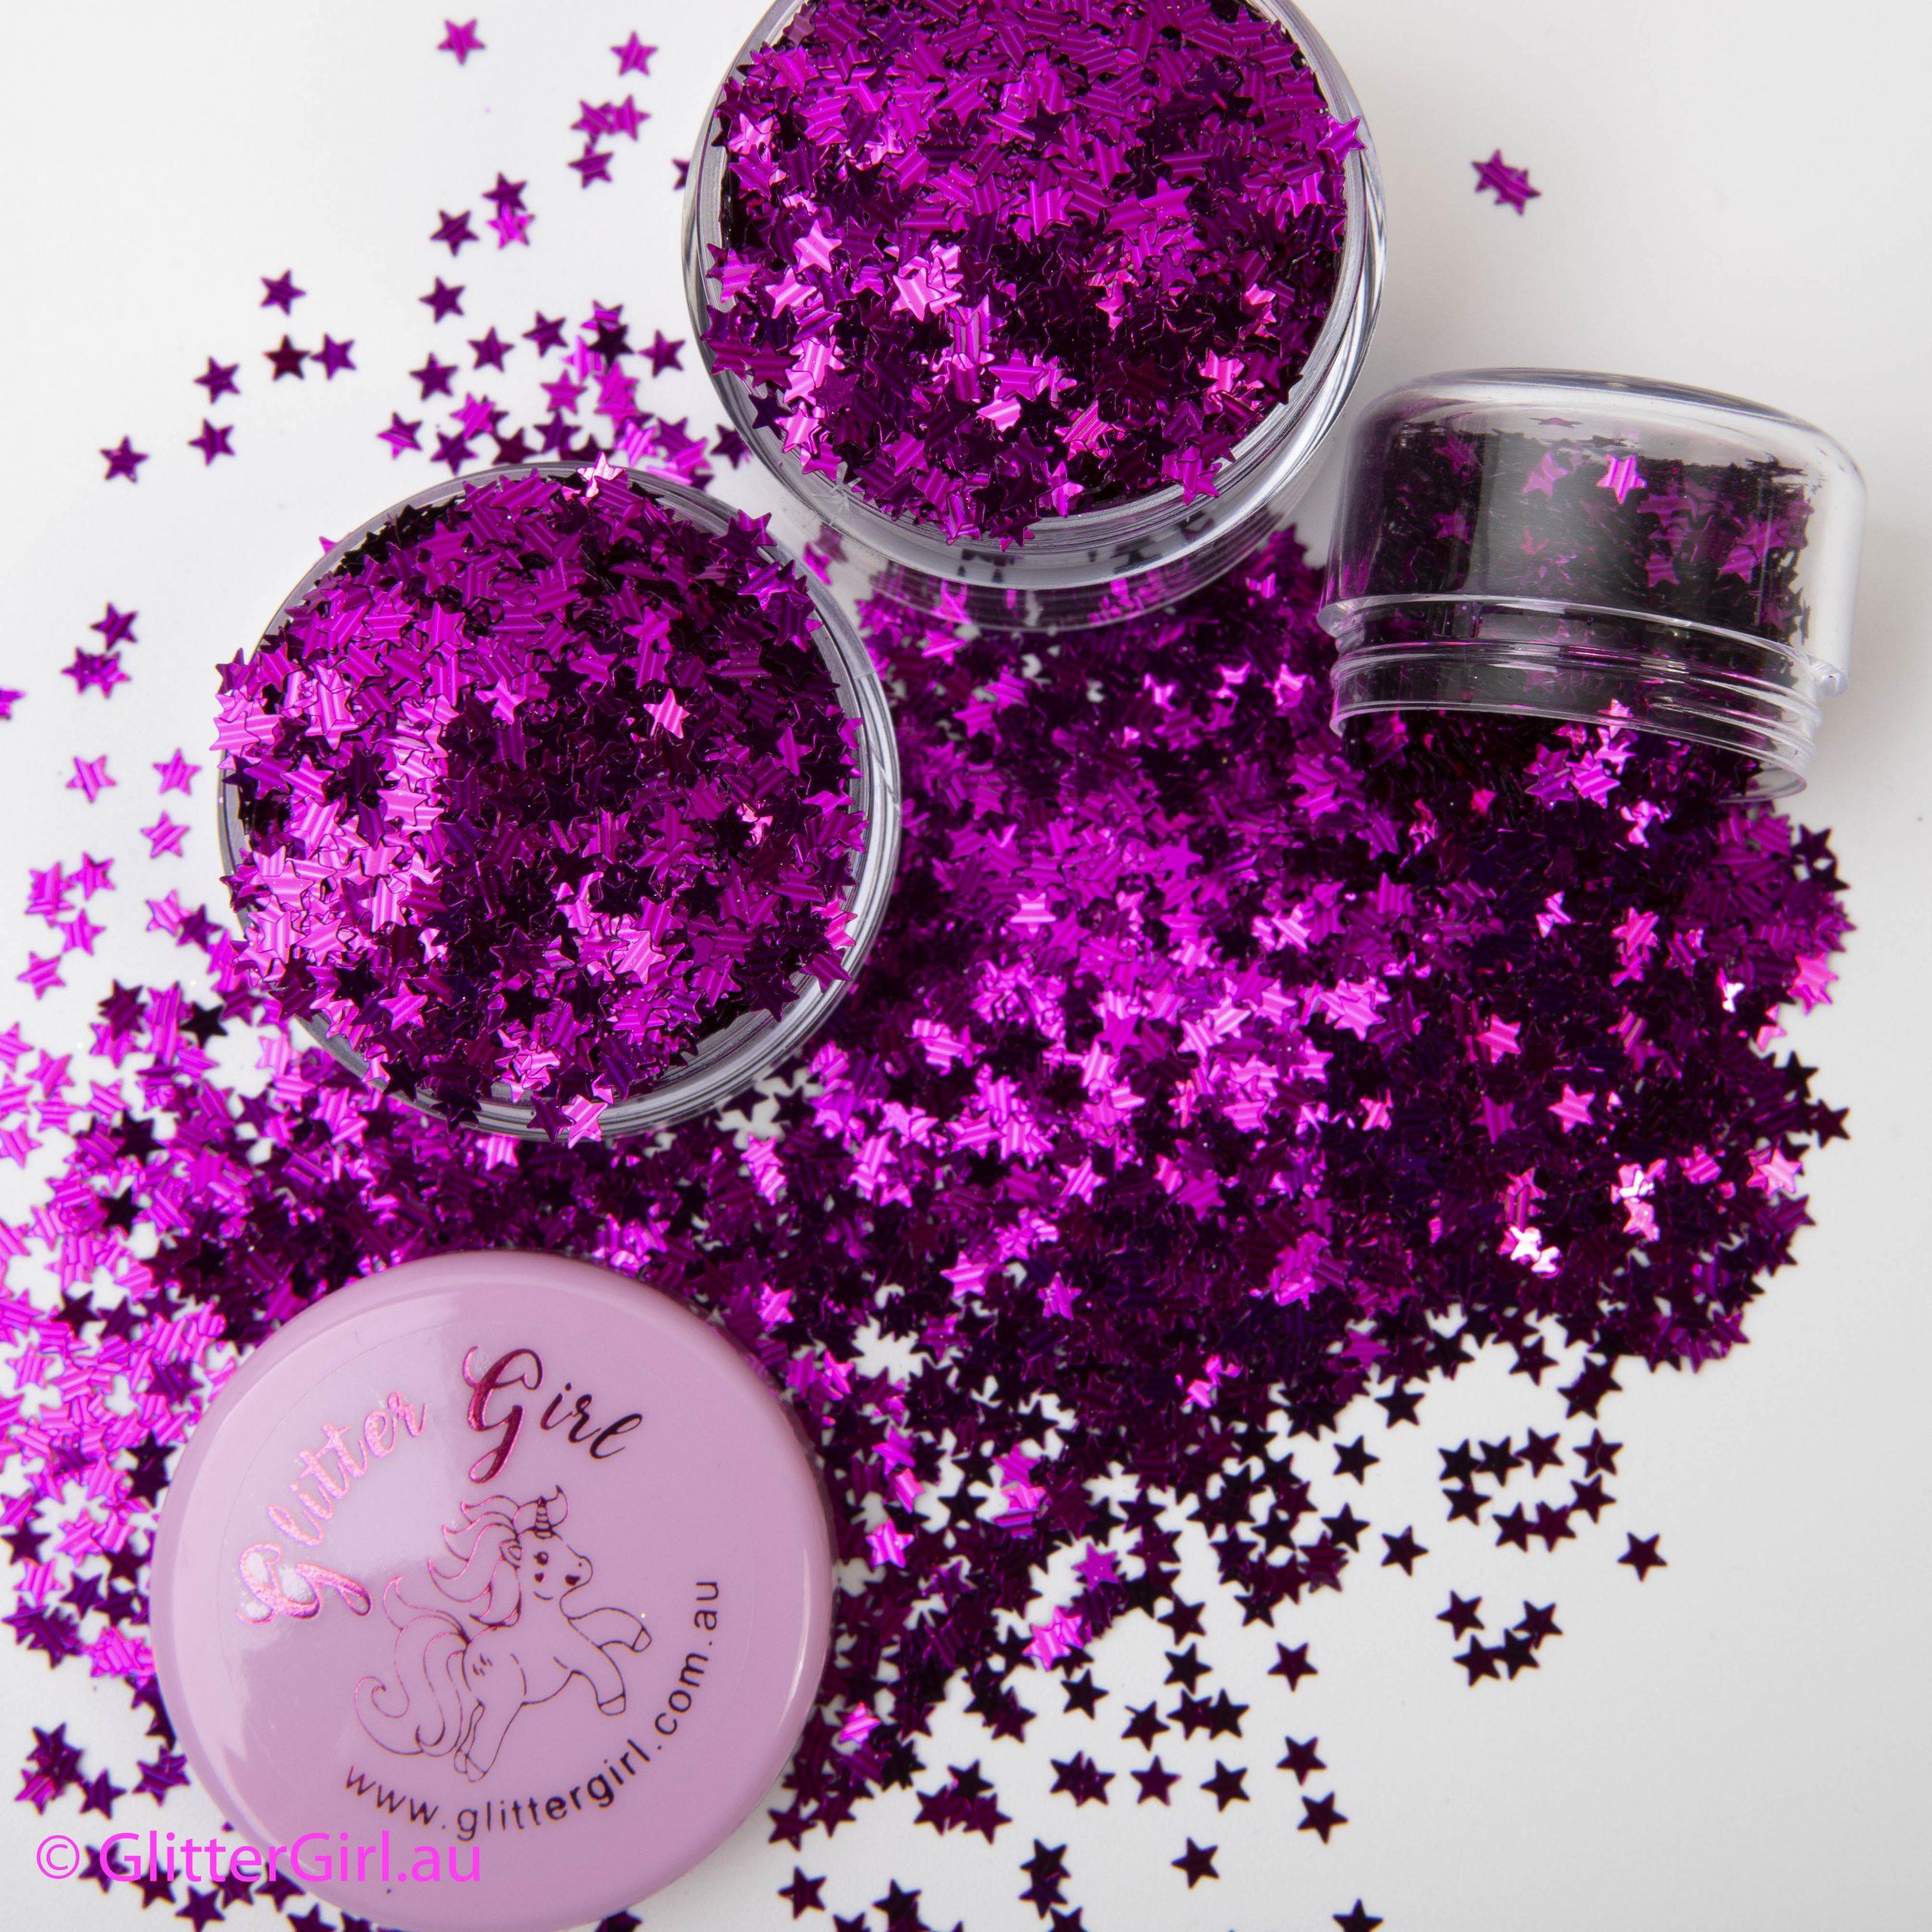 Pink Stars Eco Glitter Glitter Girl gold Coast